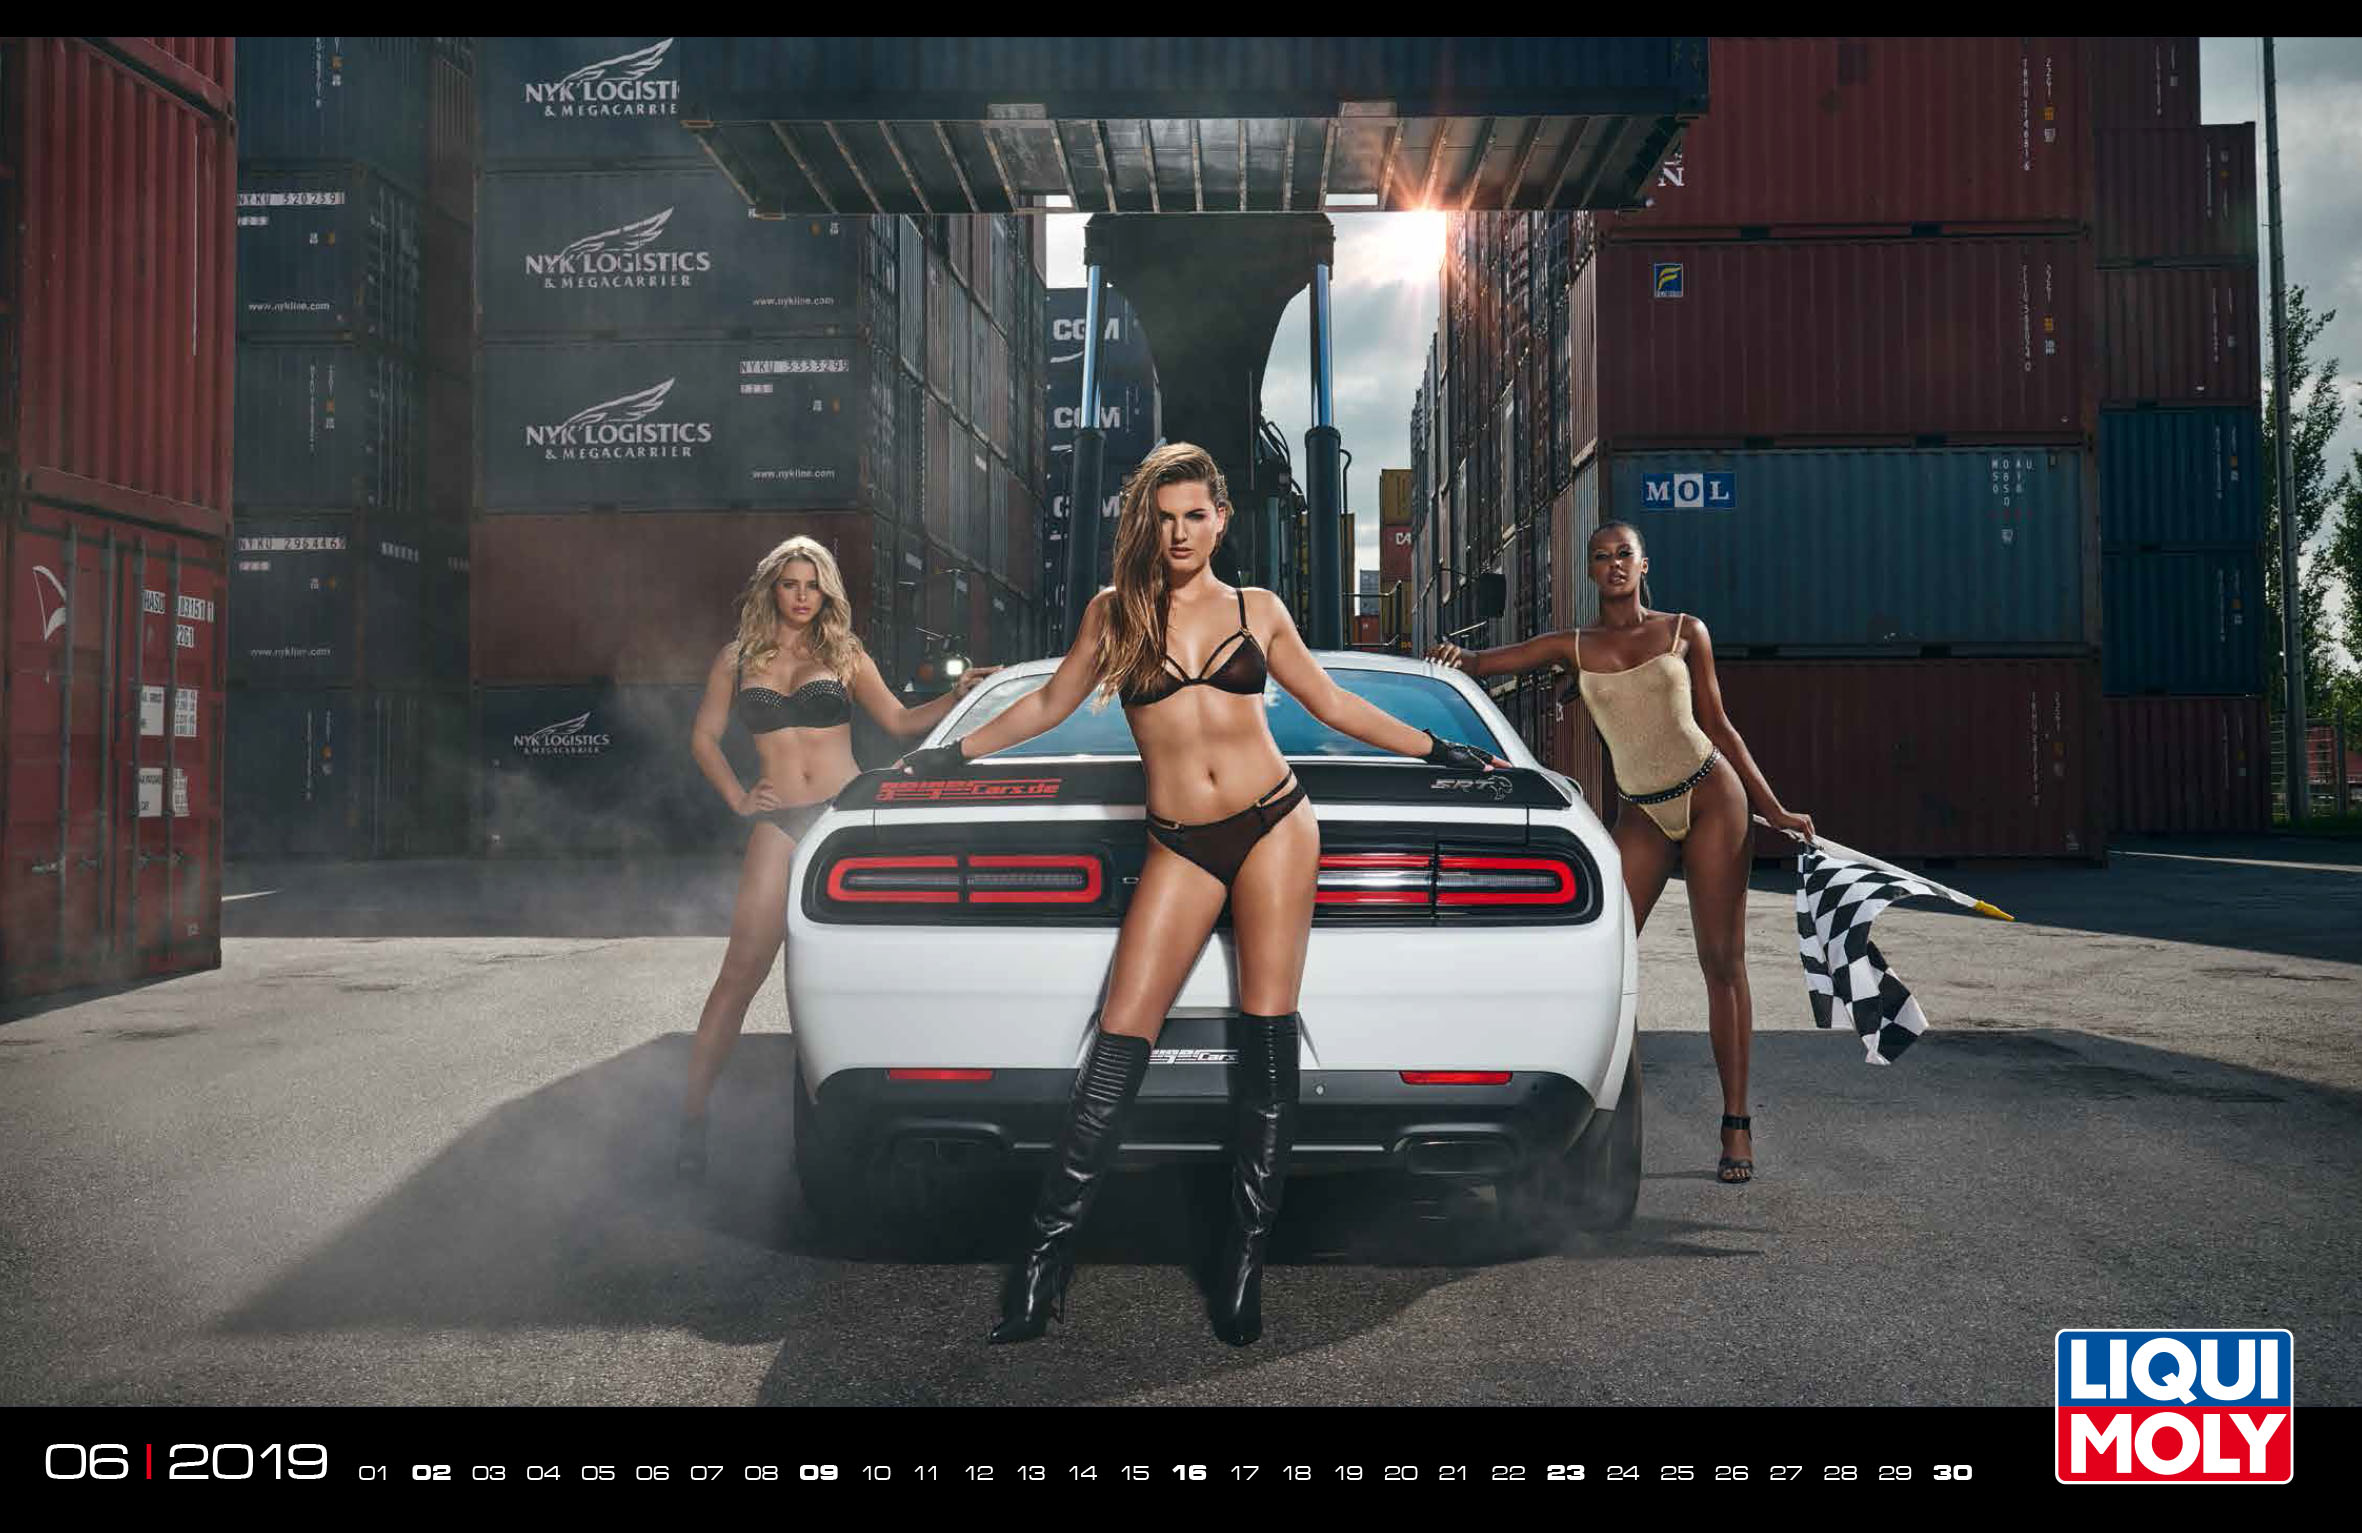 2019 Liqui Moly naked (56 photo), Sexy, Is a cute, Feet, in bikini 2020